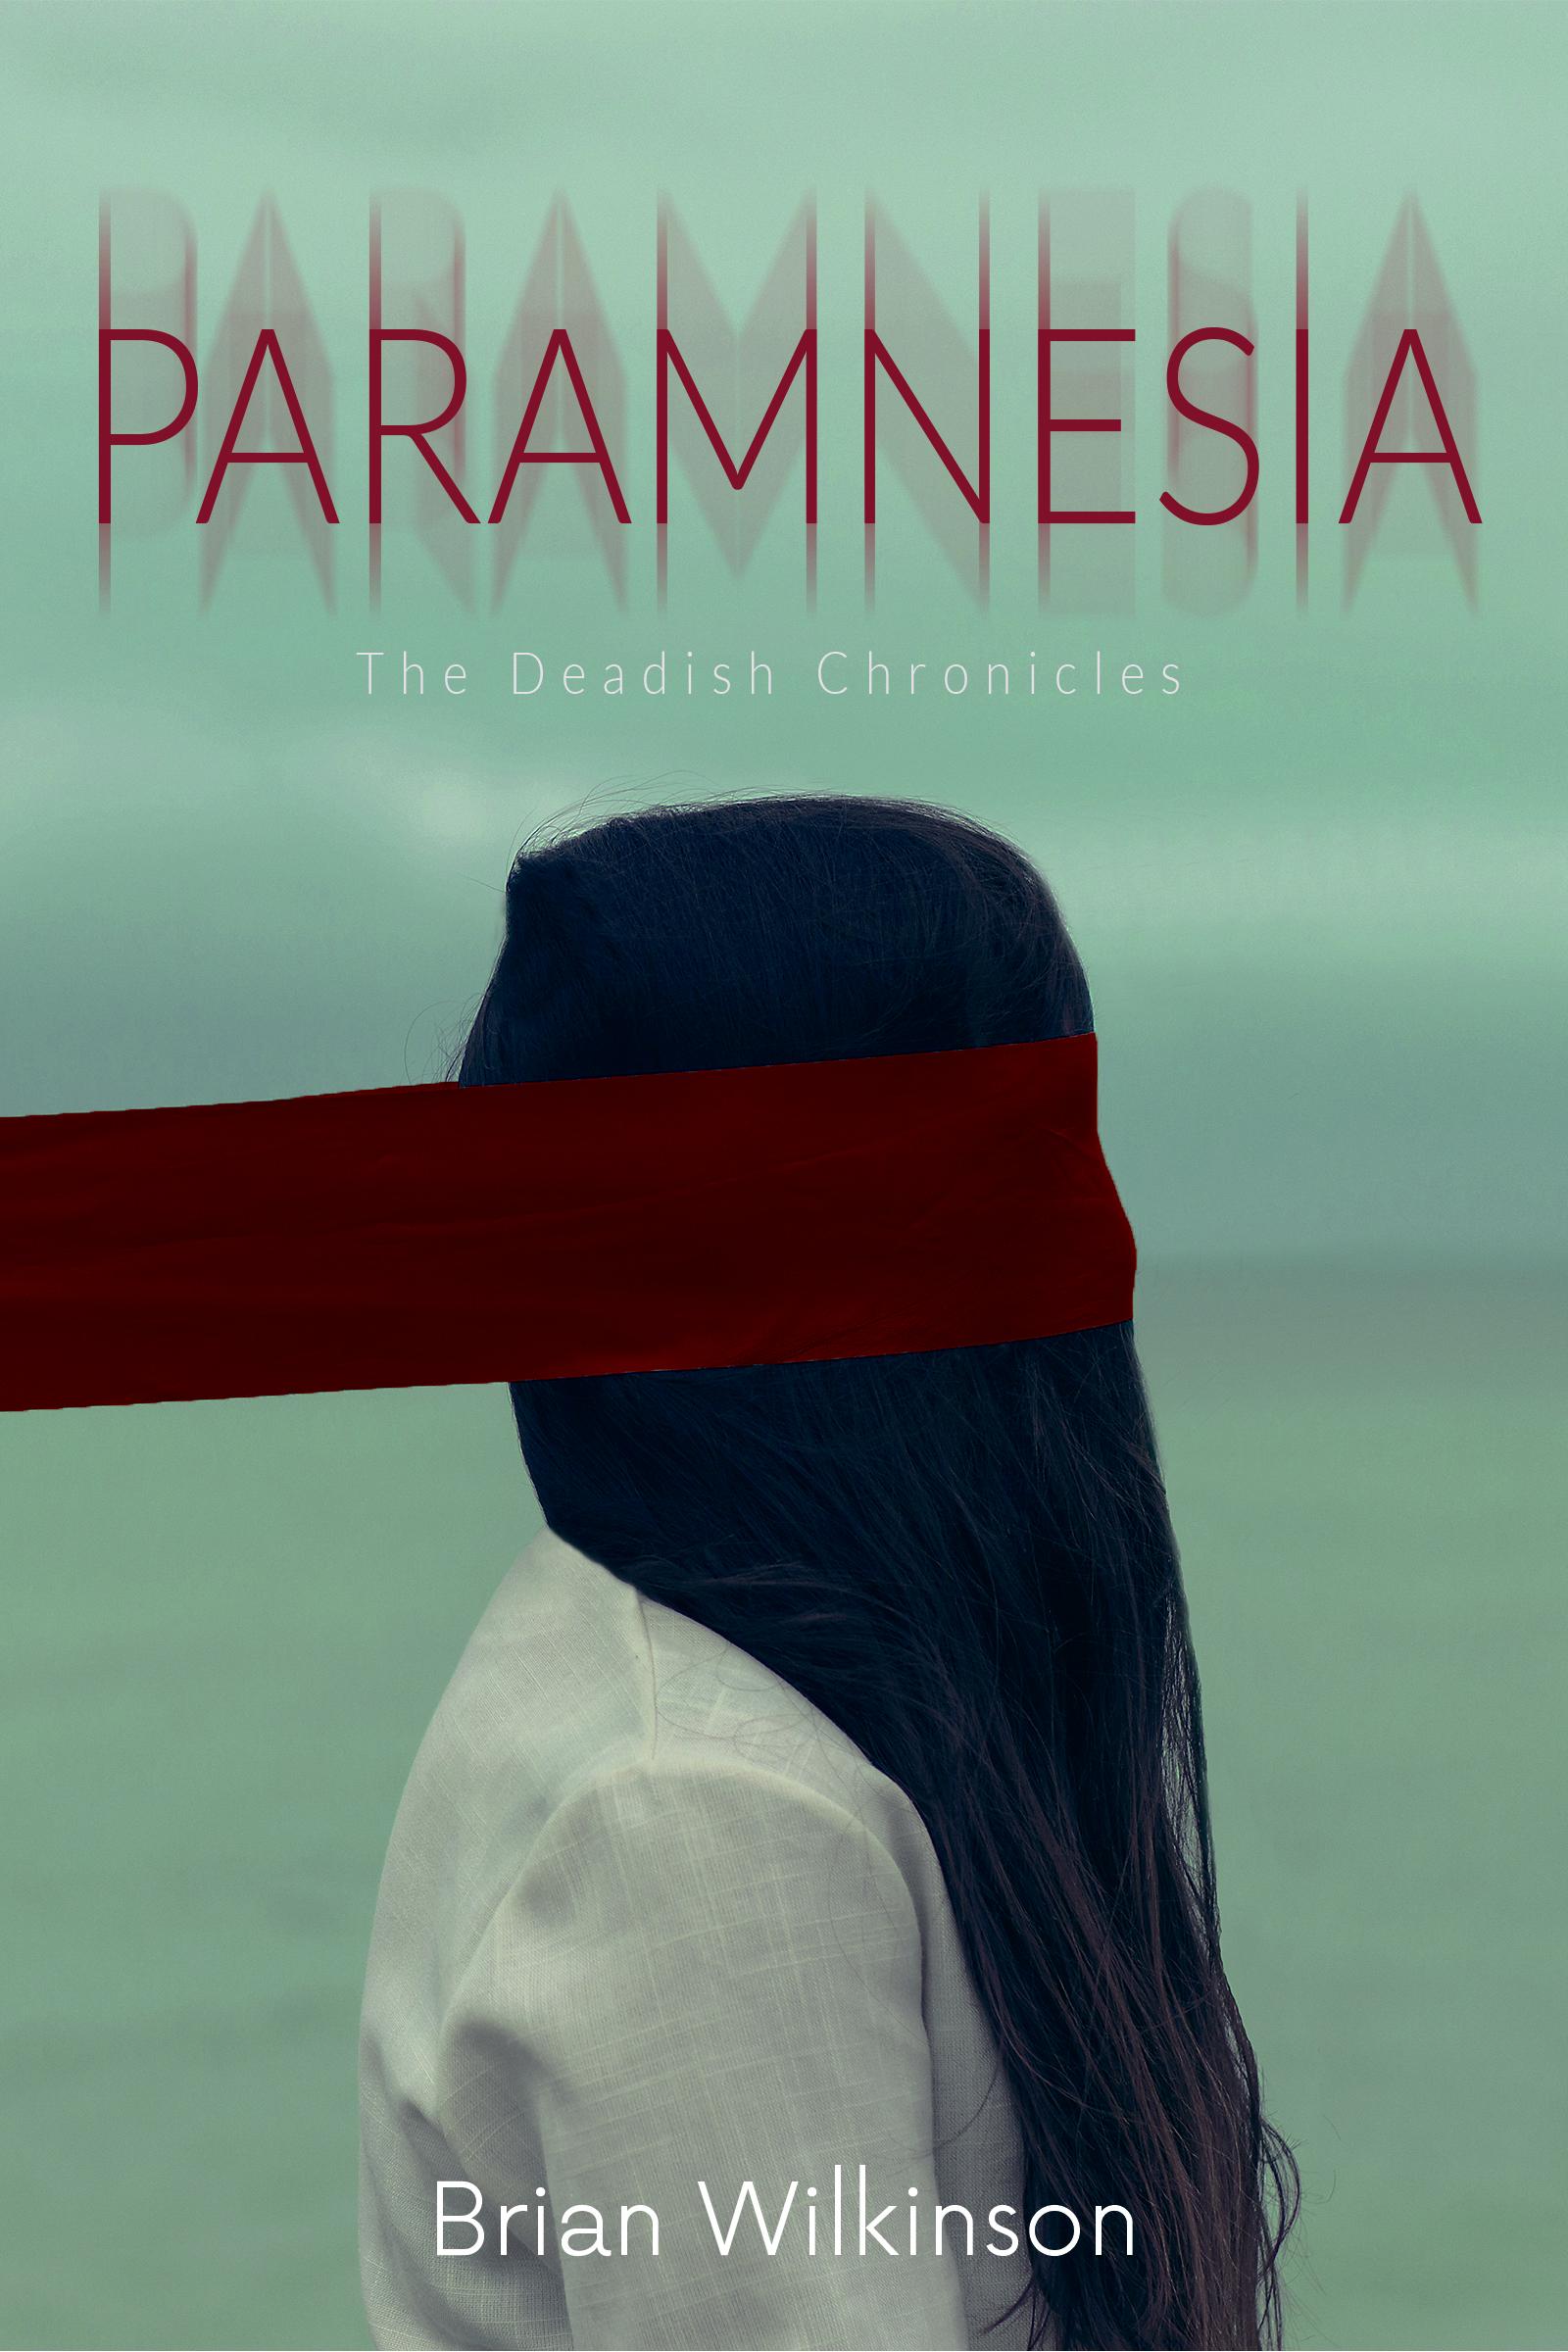 Paramnesia: The Deadish Chronicles